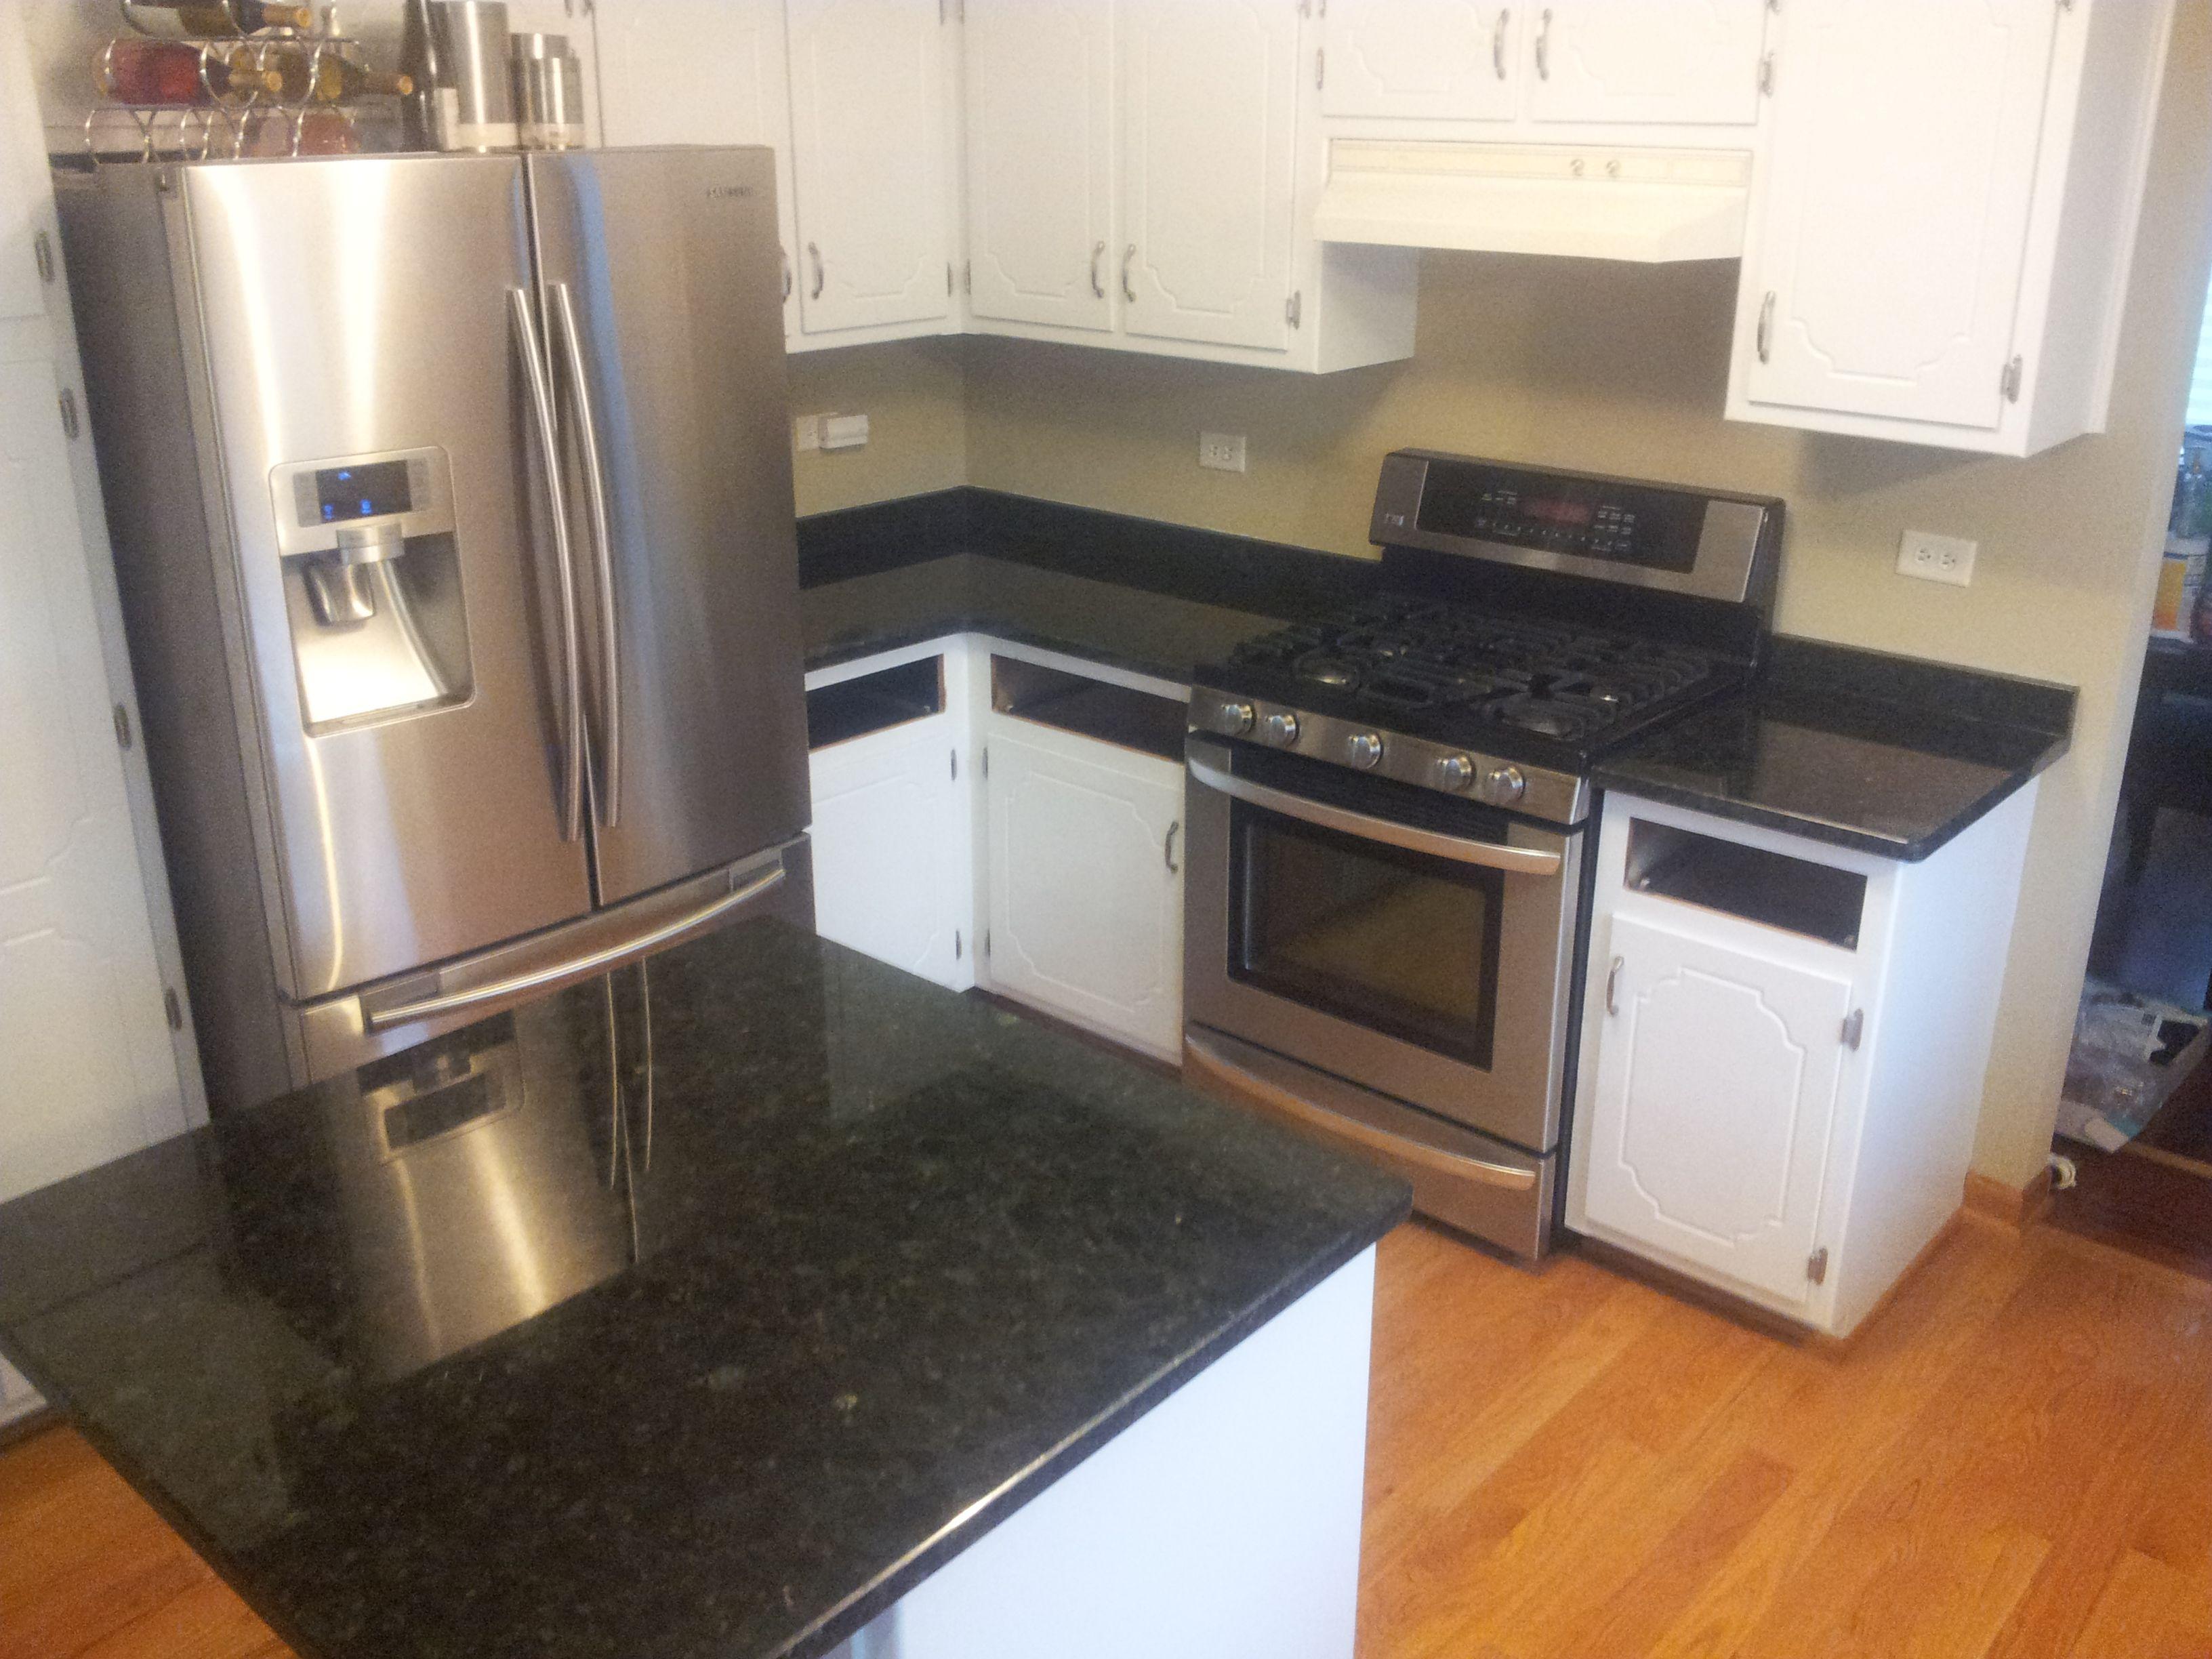 Incroyable Art Granite Countertops Inc. 1020 Lunt Ave . Unit F Schaumburg IL , 60193  Tel